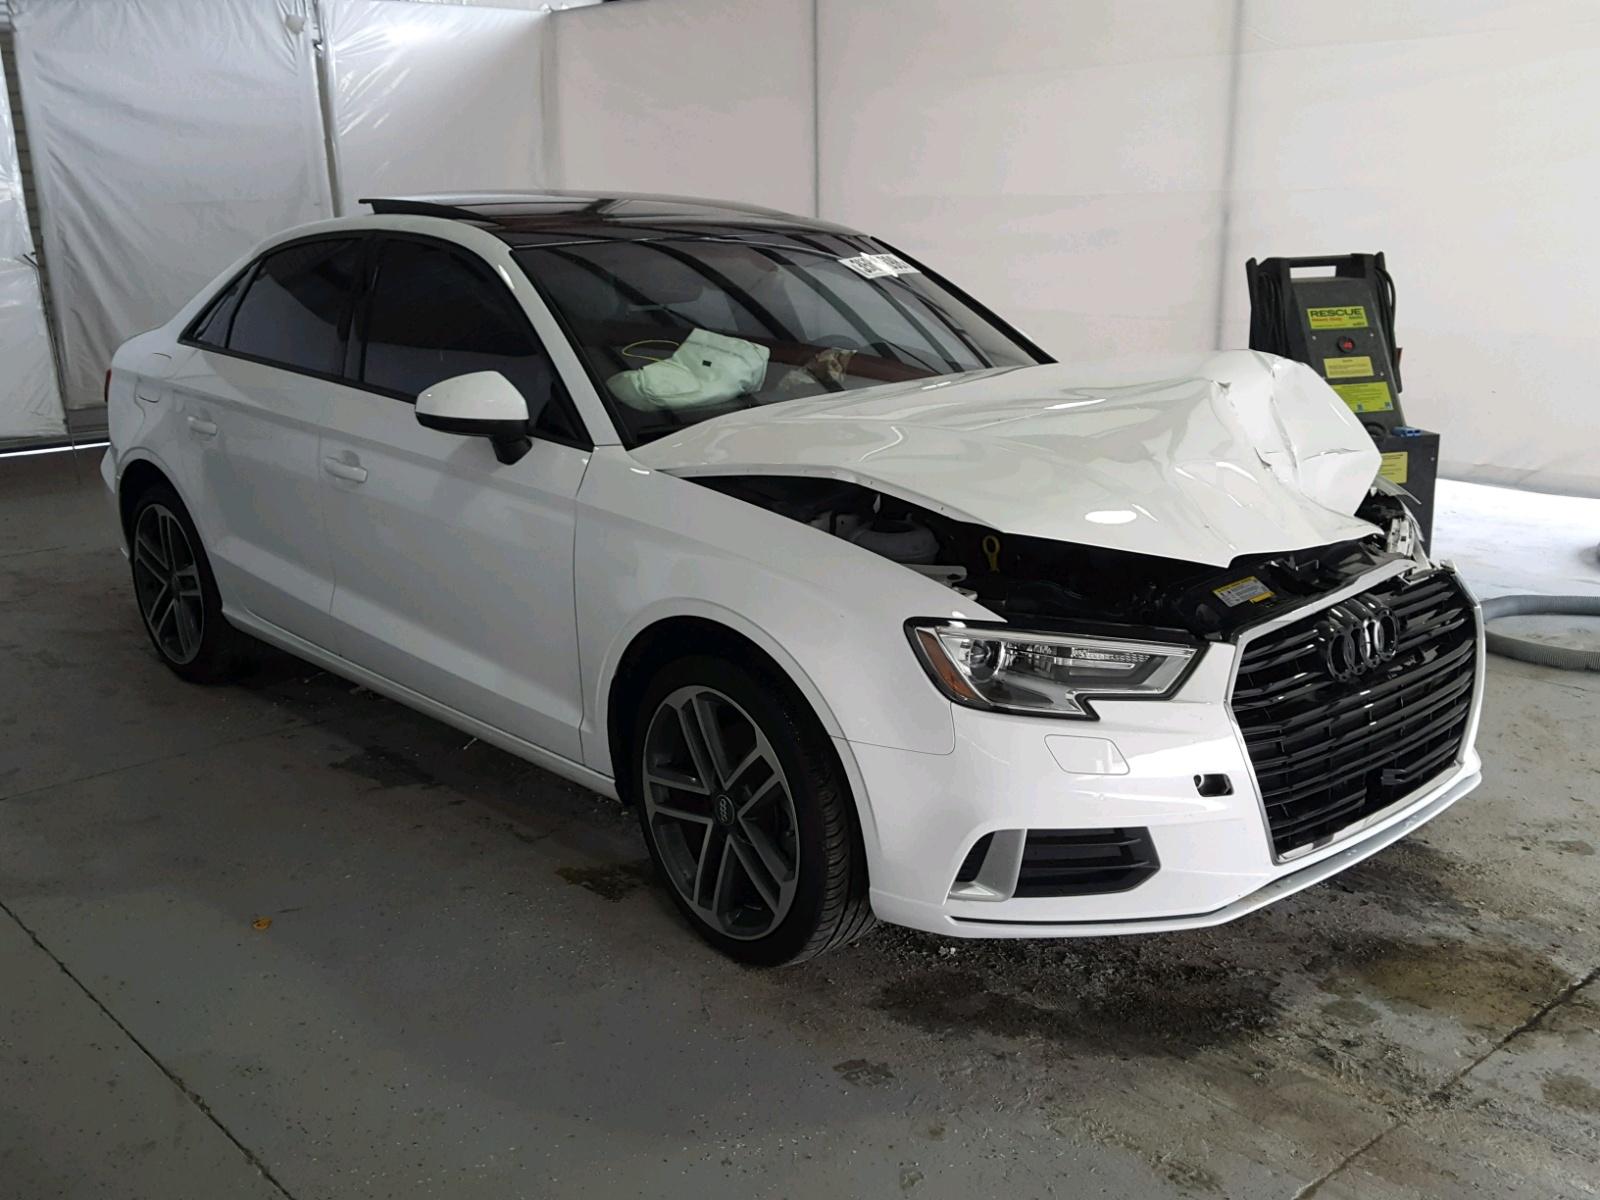 Audi A Premium For Sale At Copart Savannah GA Lot - Audi savannah